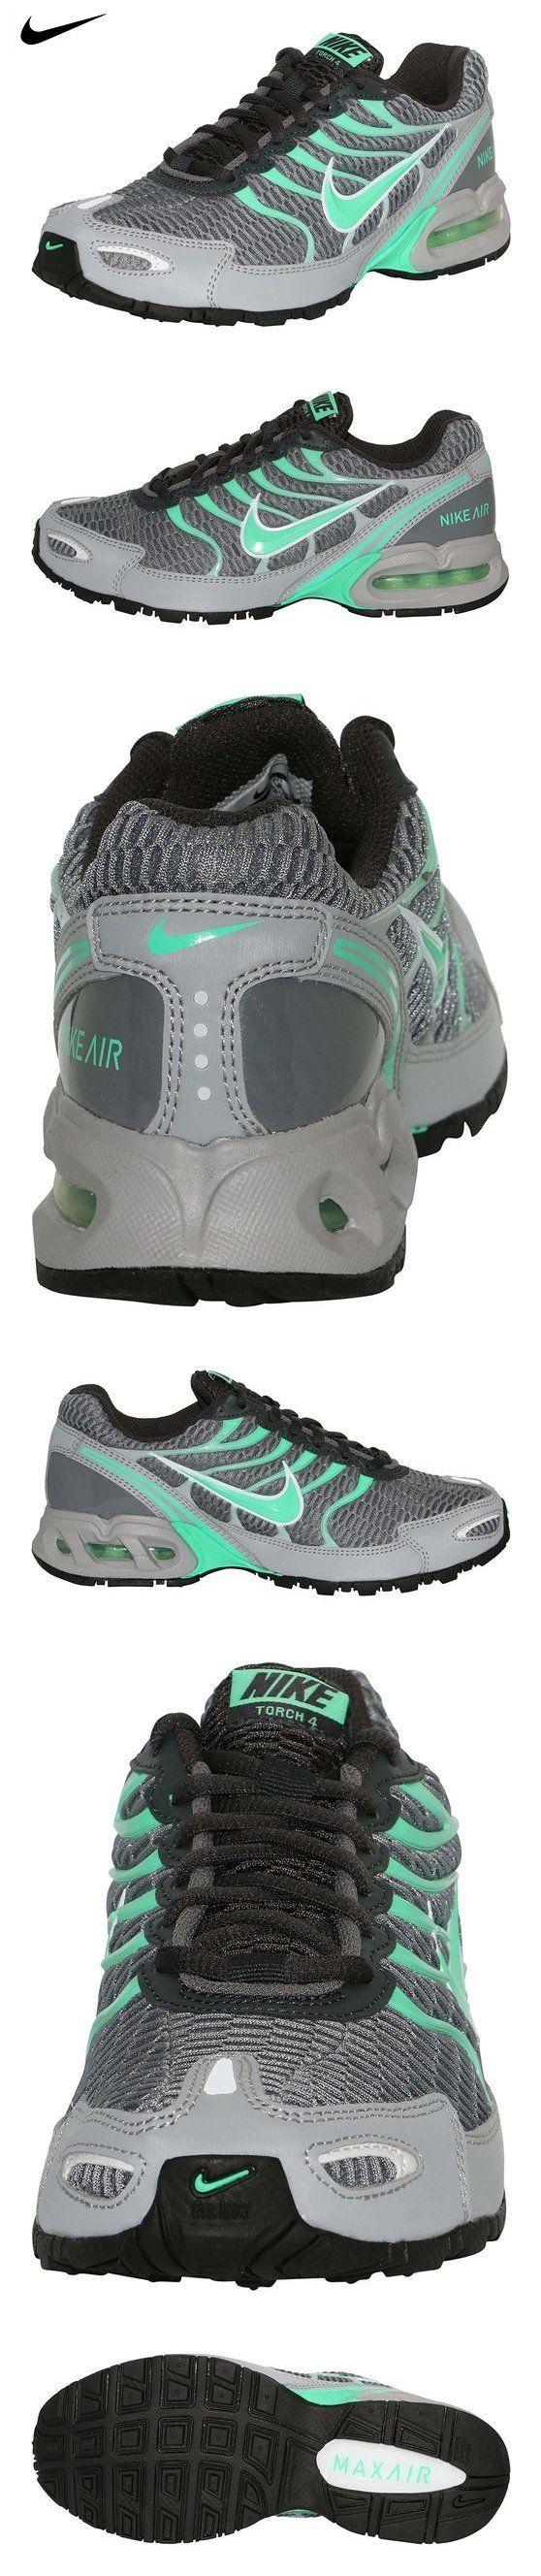 nike womens lunartempo running shoes omaha